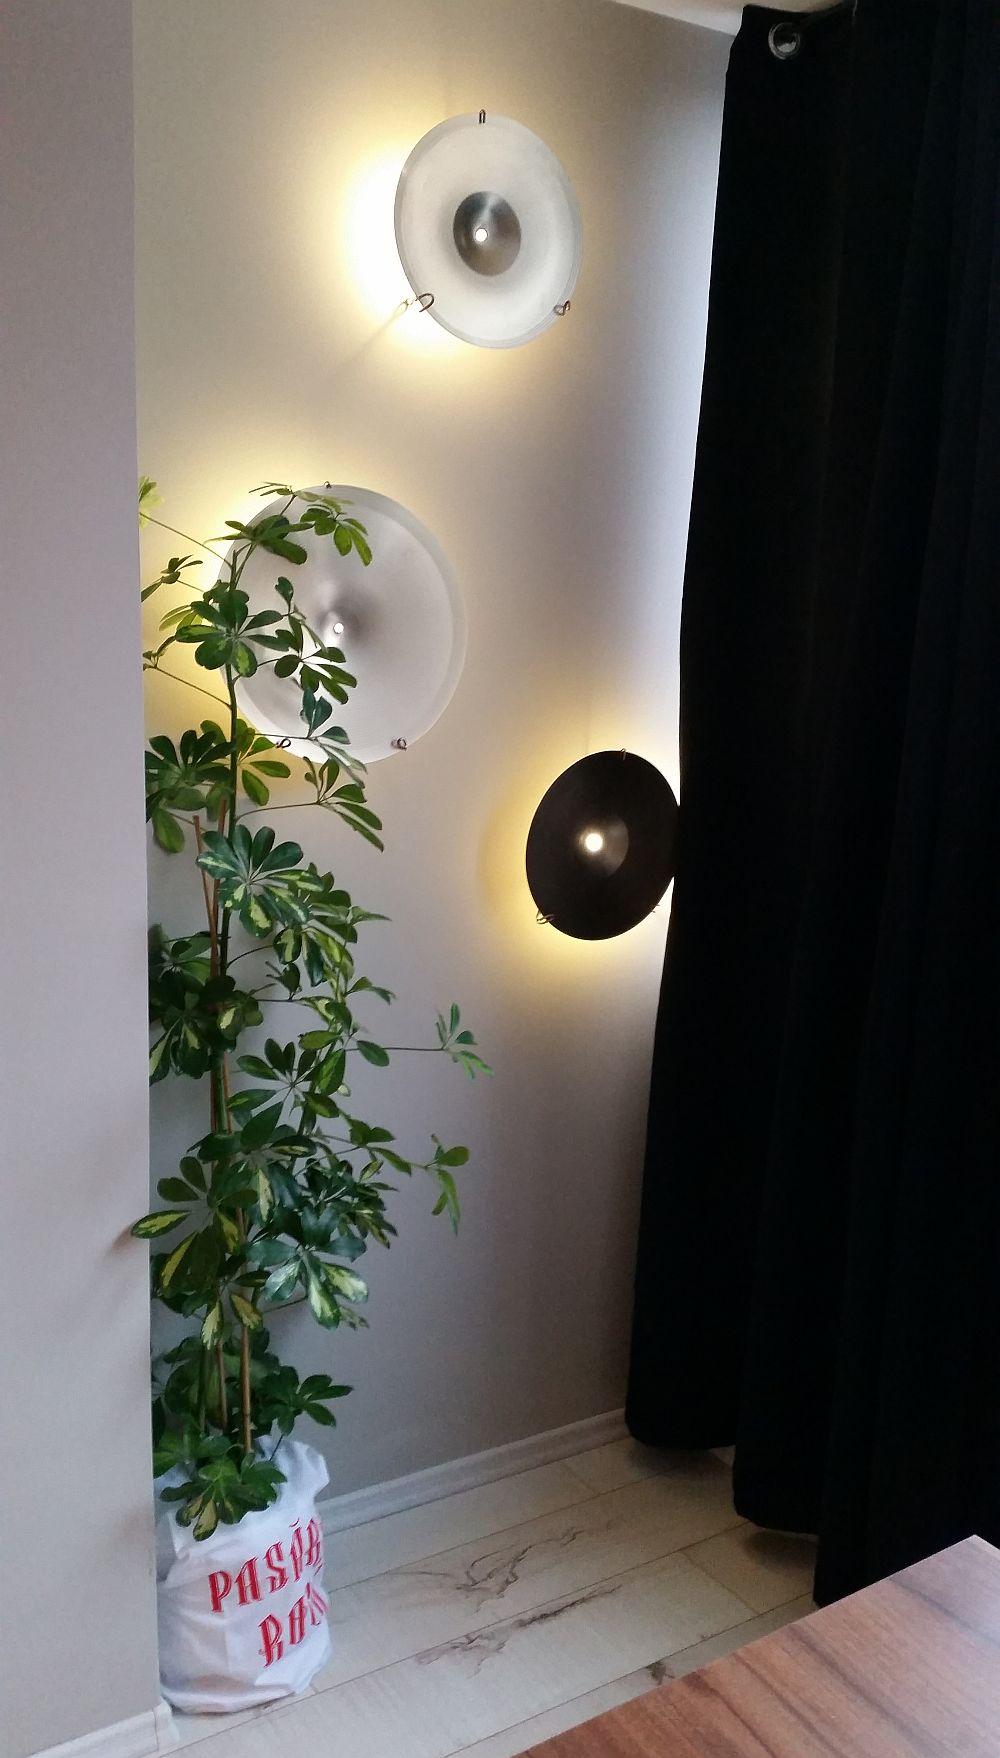 adelaparvu.com despre amenajare apartament Alice Muller din emisiunea Visuri la cheie de la ProTV, sezonul I, 2014 (13)